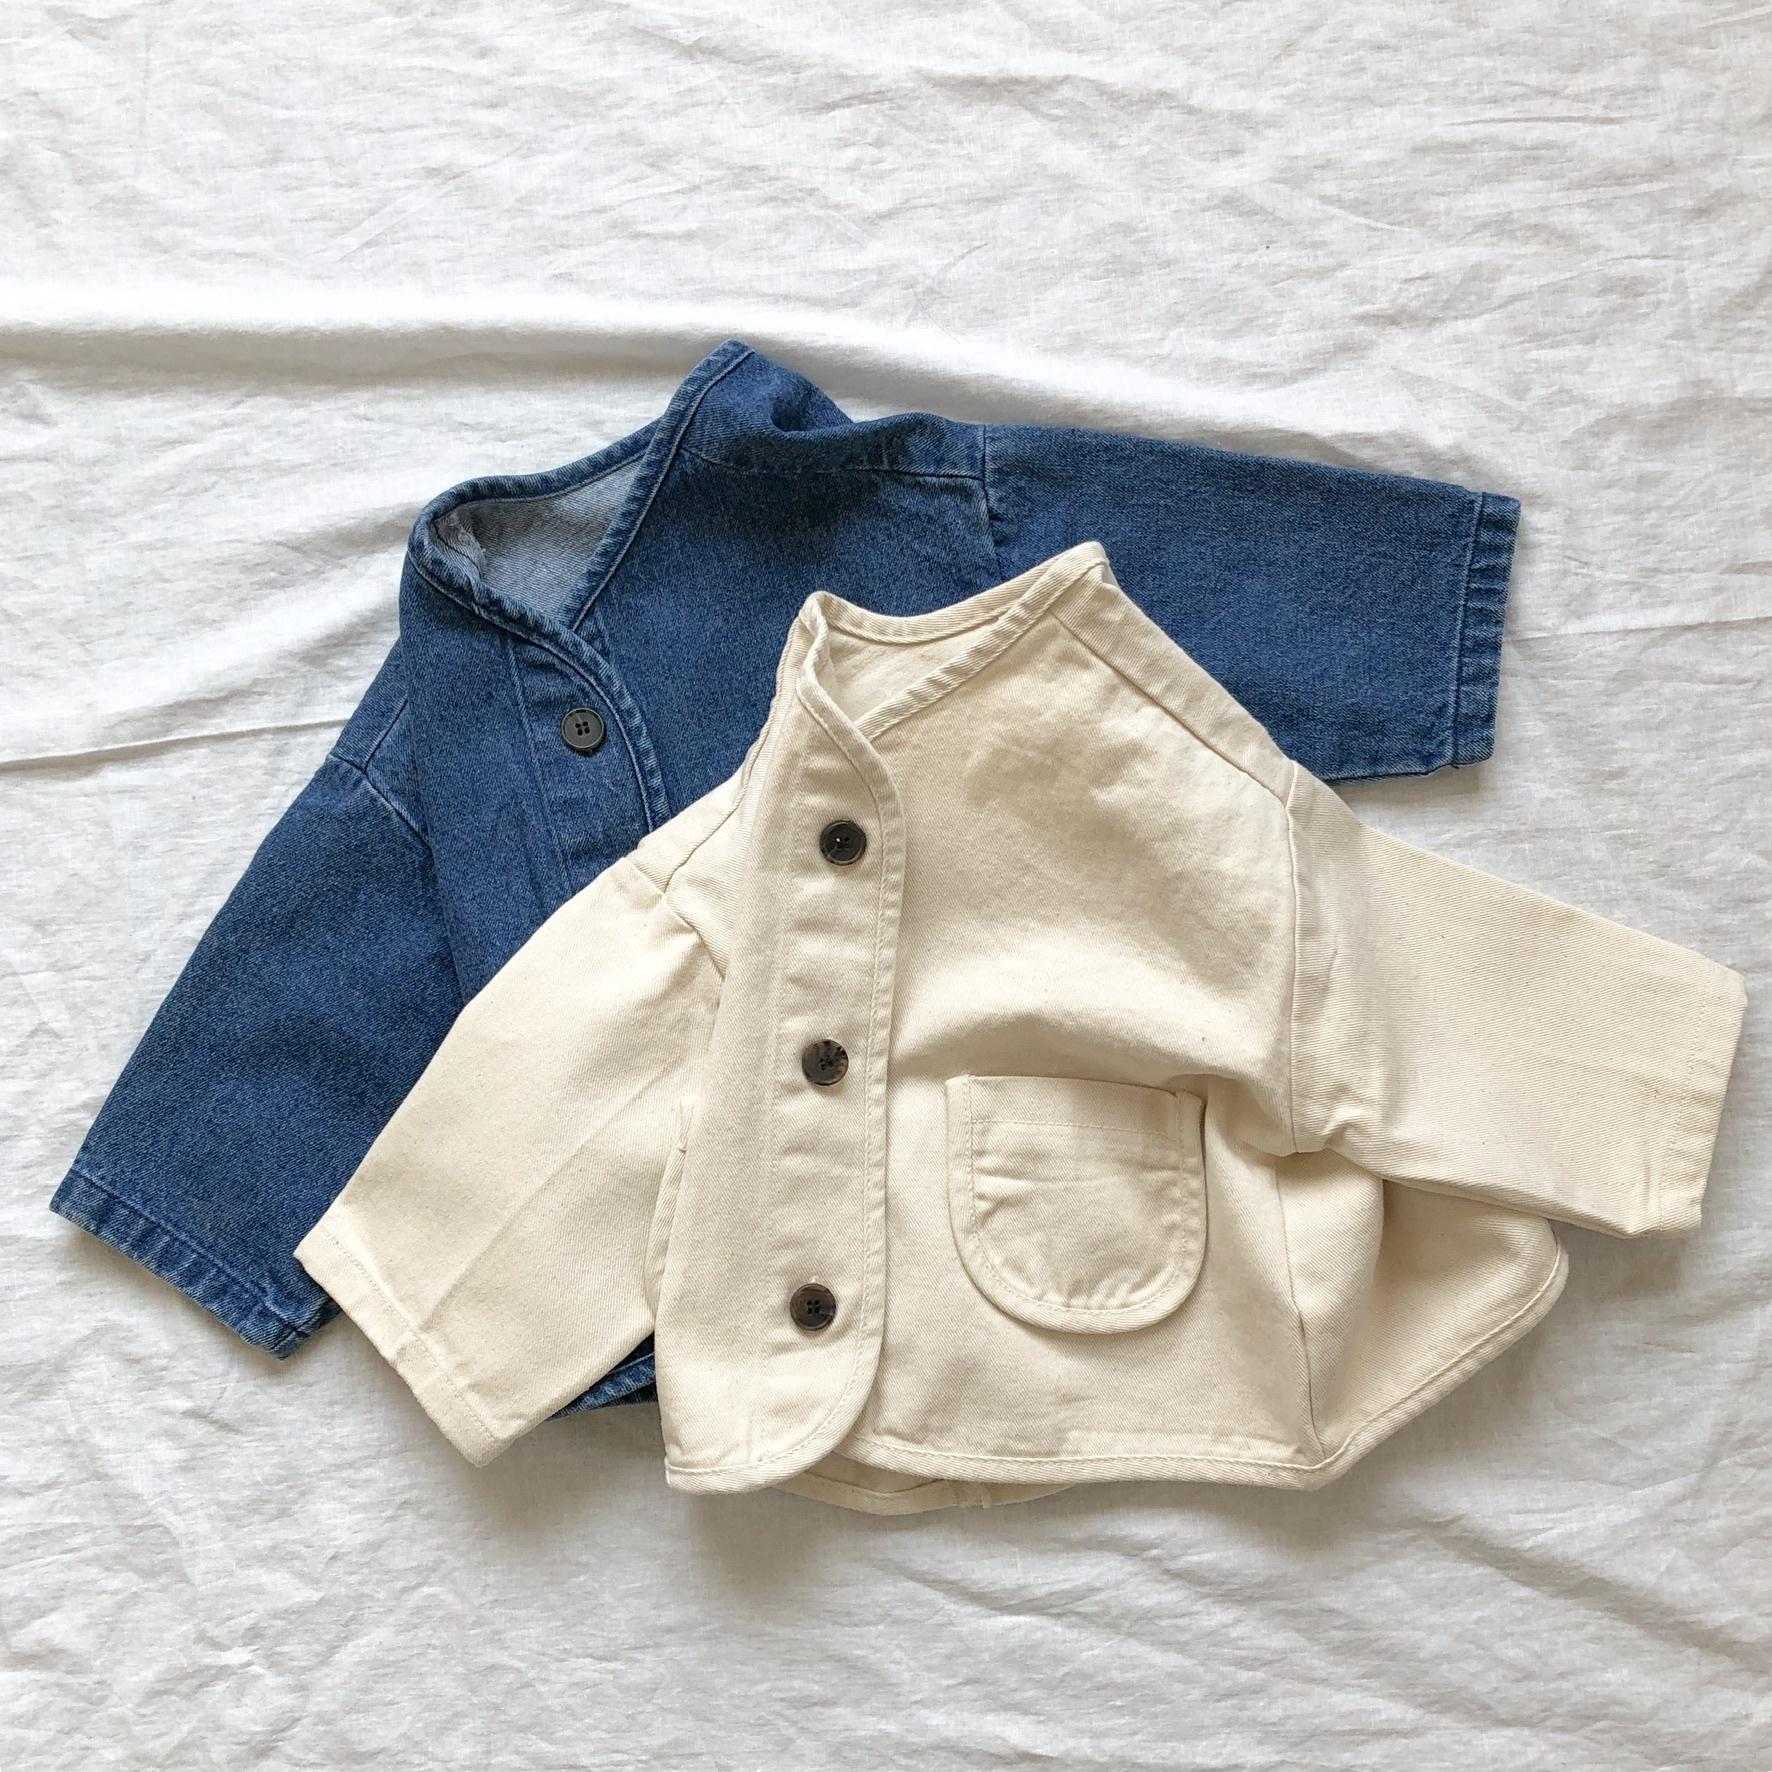 《 162 》 Denim jacket